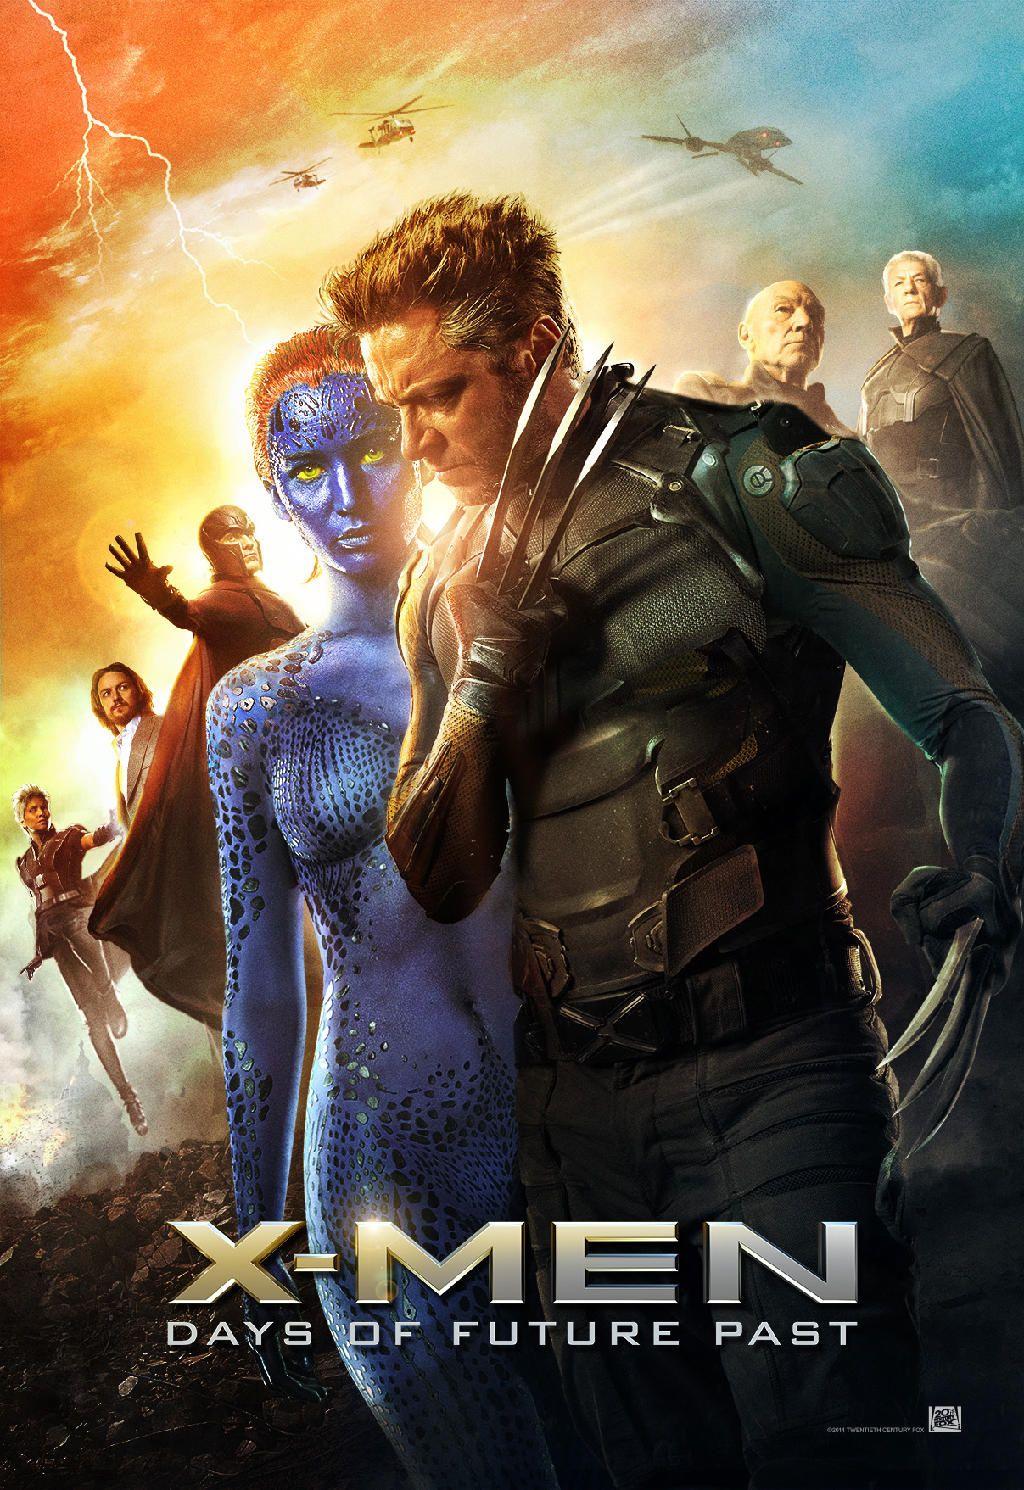 Epic Movie Xmen Daysoffuturepast Days Of Future Past X Men New Poster